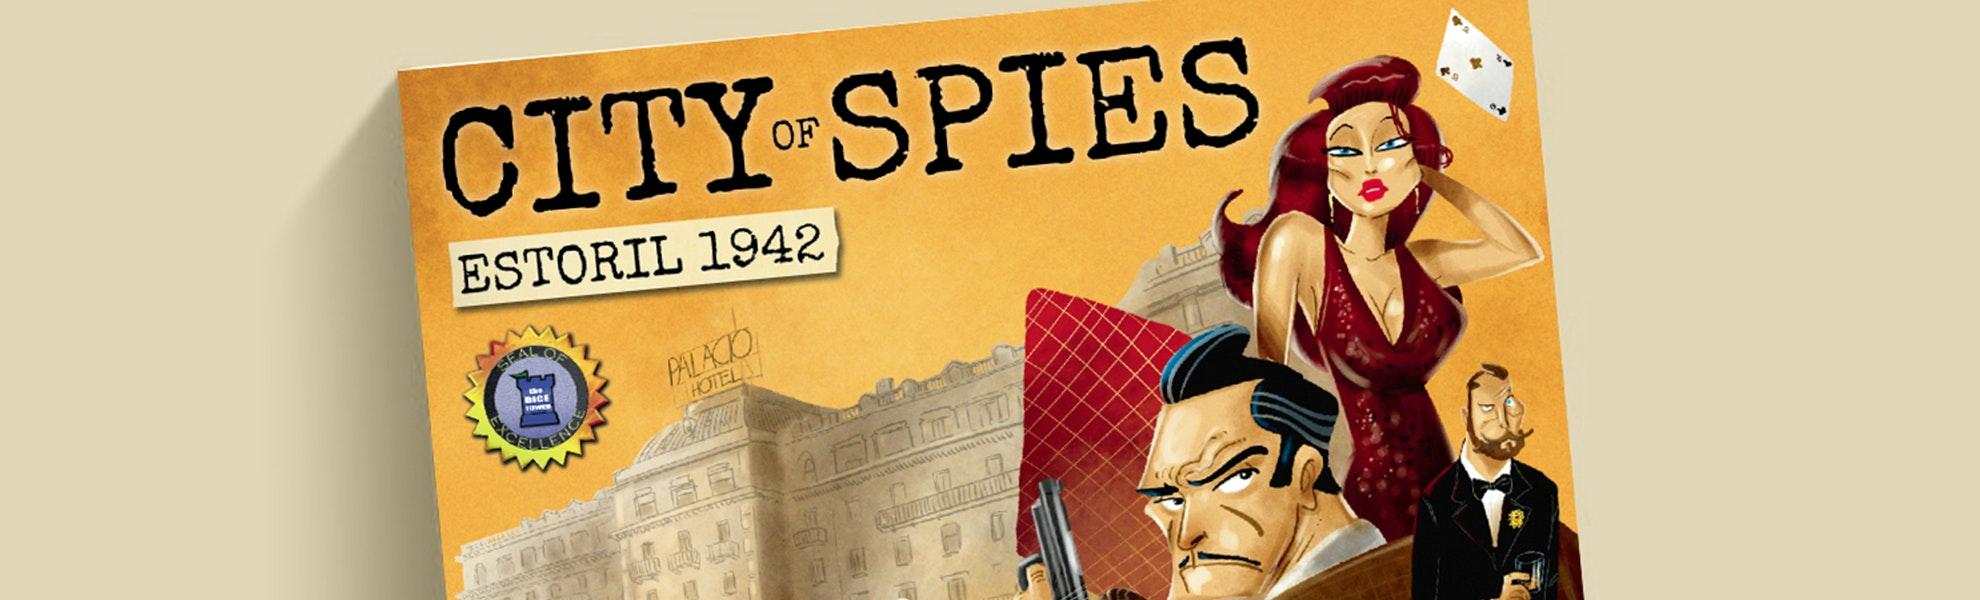 City of Spies: Estoril 1942 Pre-Order